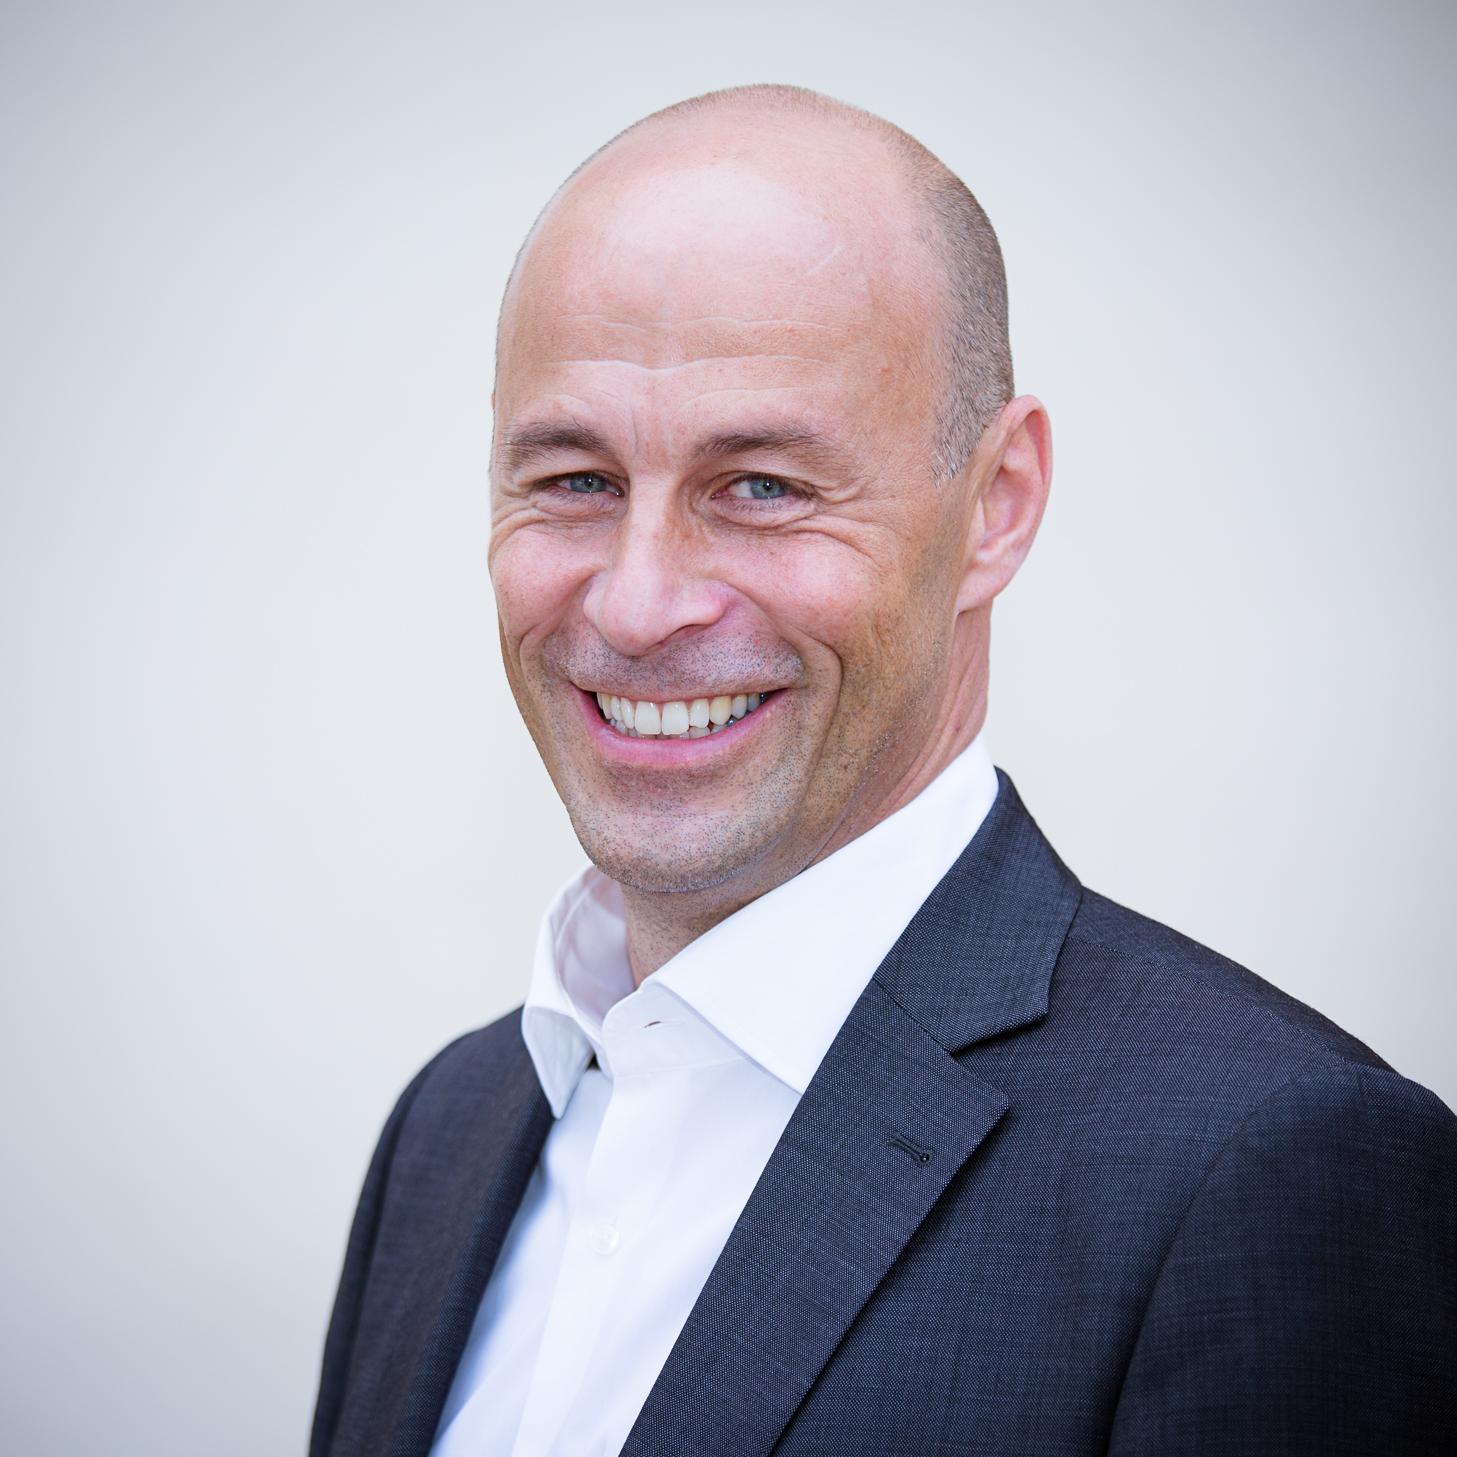 Karl-Heinz Rebhandl